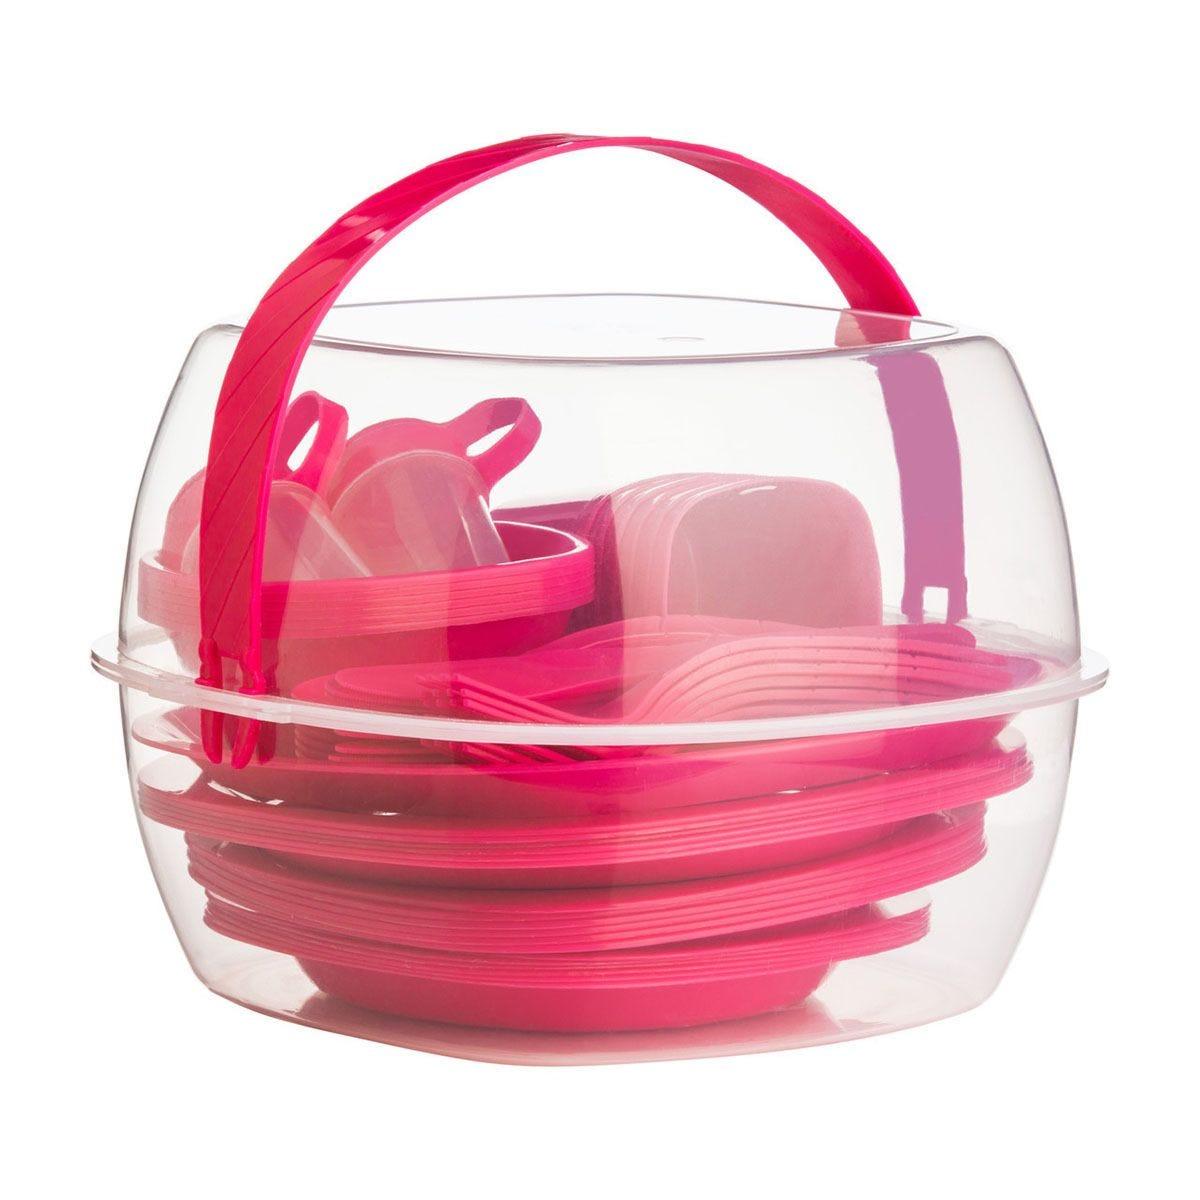 Essentials By Premier 51-Piece Picnic Set - Hot Pink